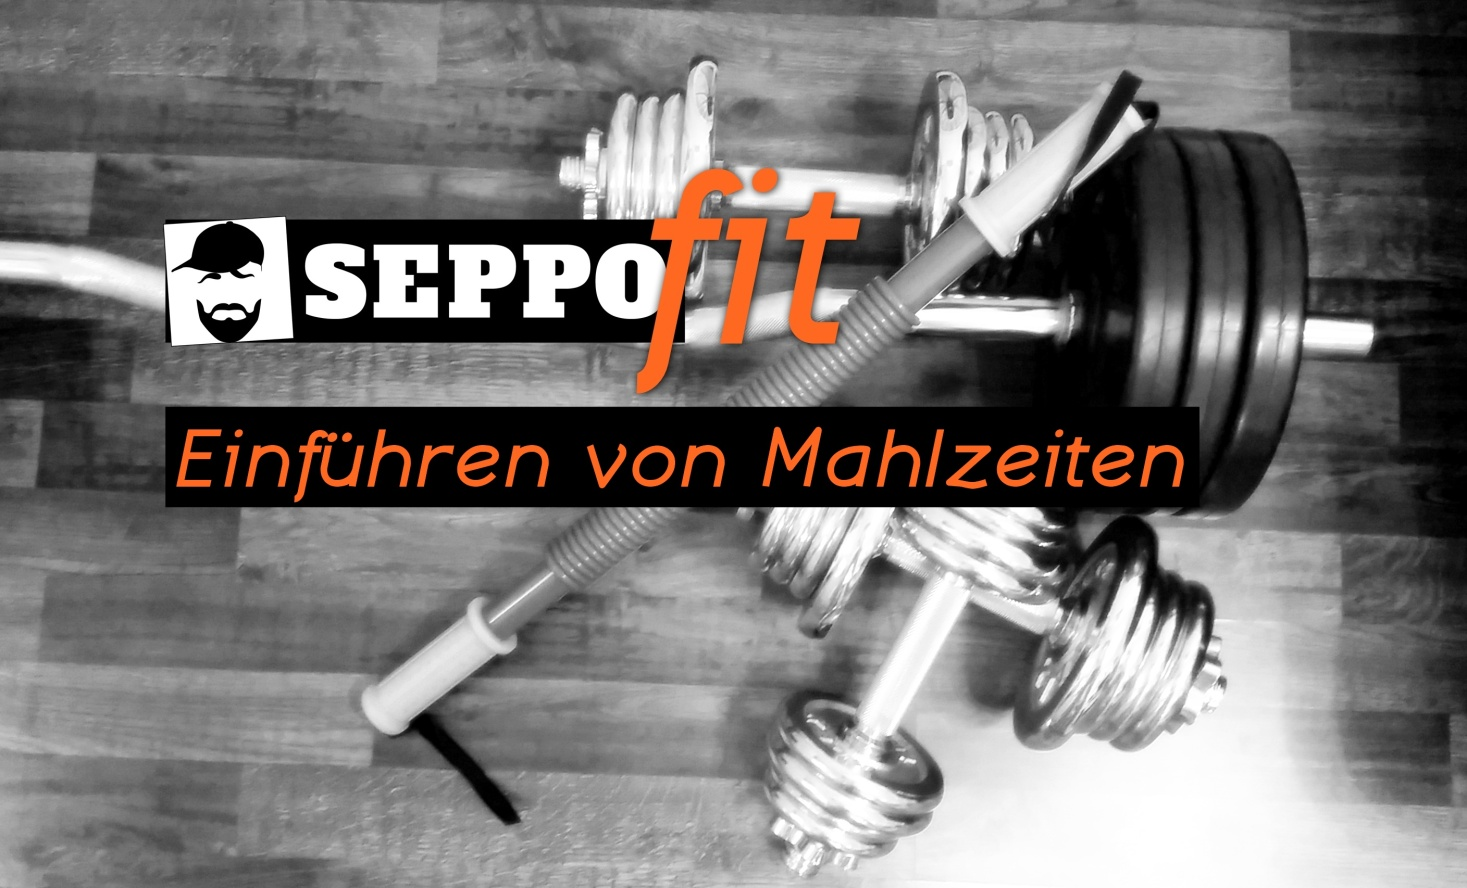 seppofit10